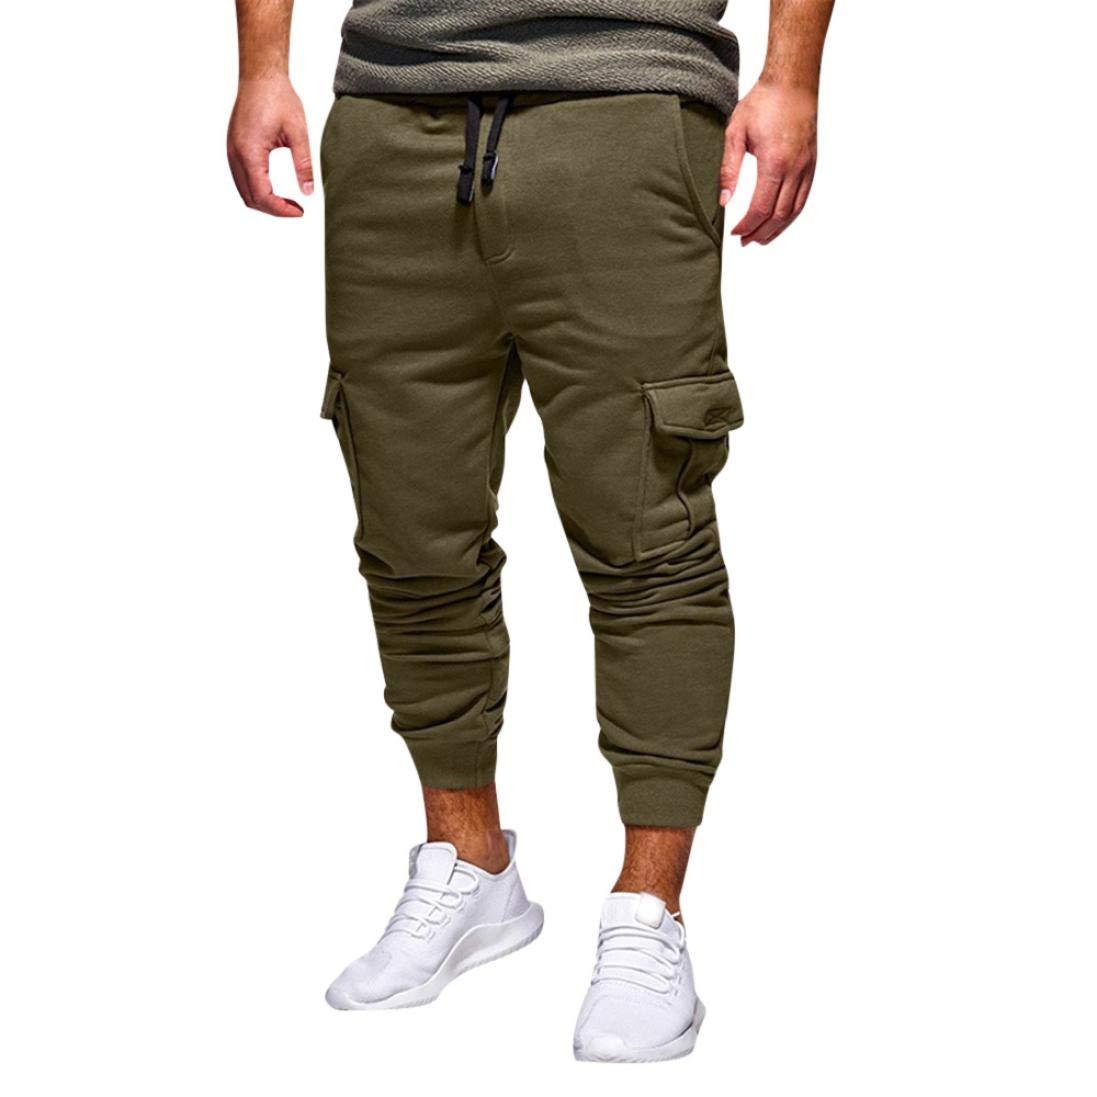 Realdo Hot!Clearance Sale Fashion Men's Sport Fitness Casual Loose Sweatpants Drawstring Jogger Pant(X-Large,Green)